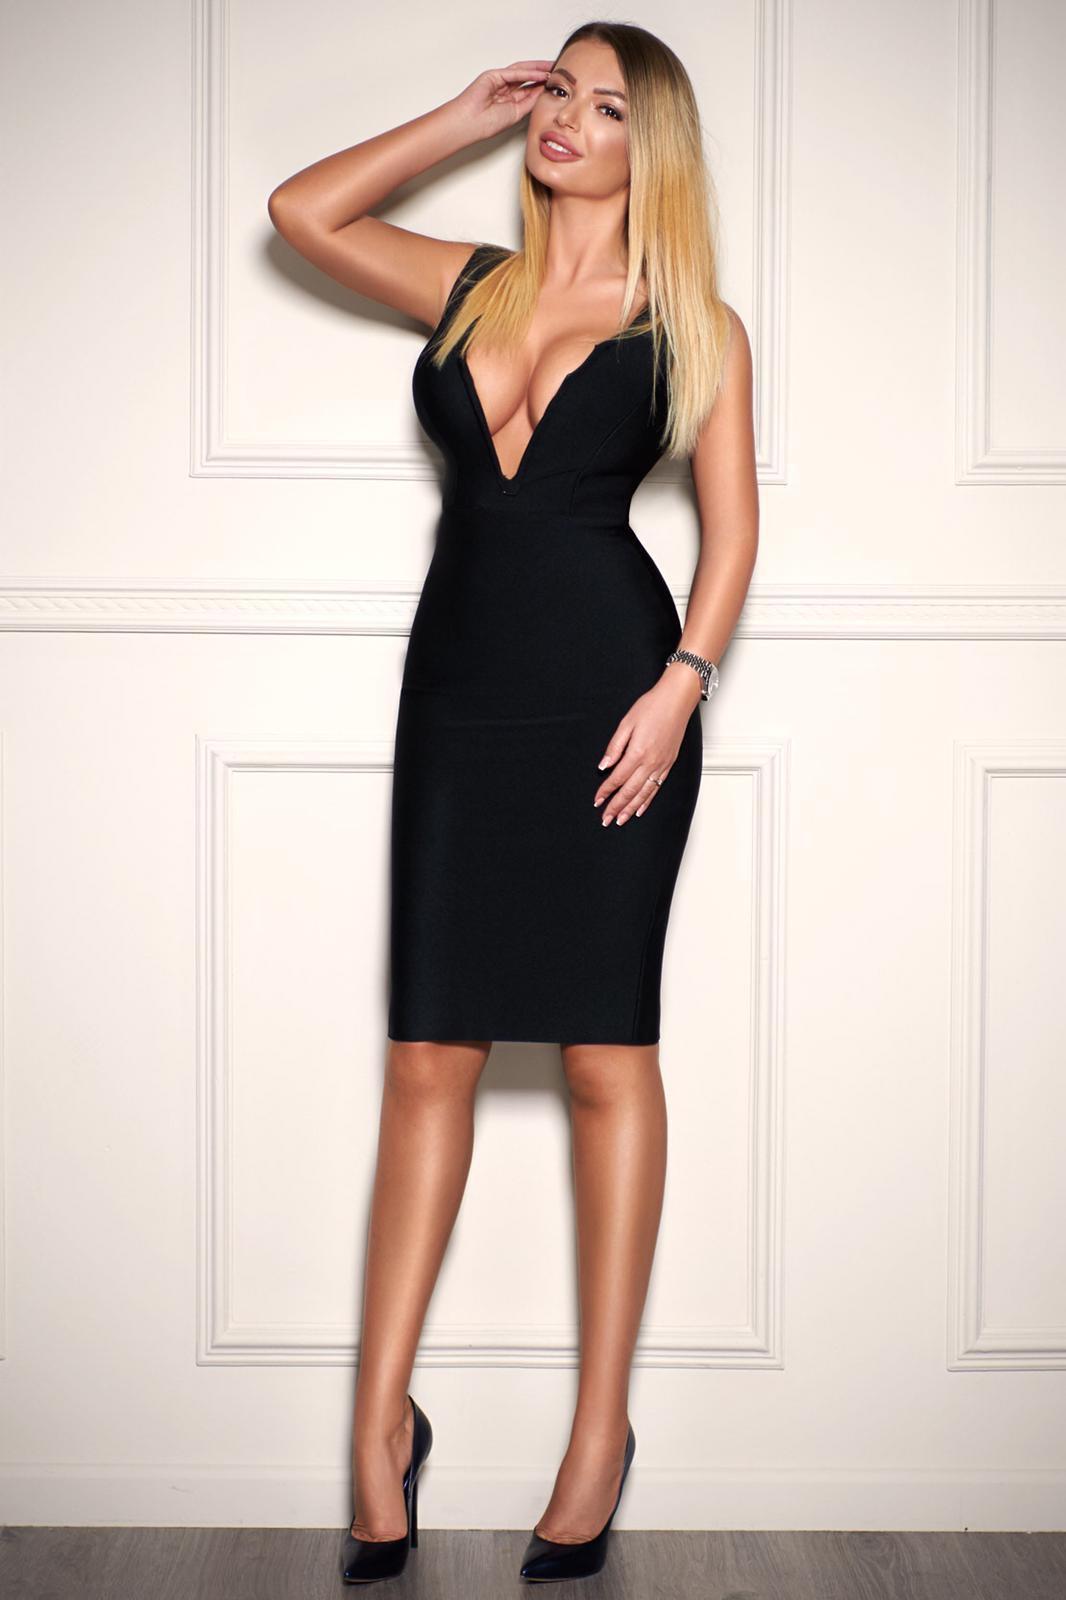 Laura from London Escorts VIP